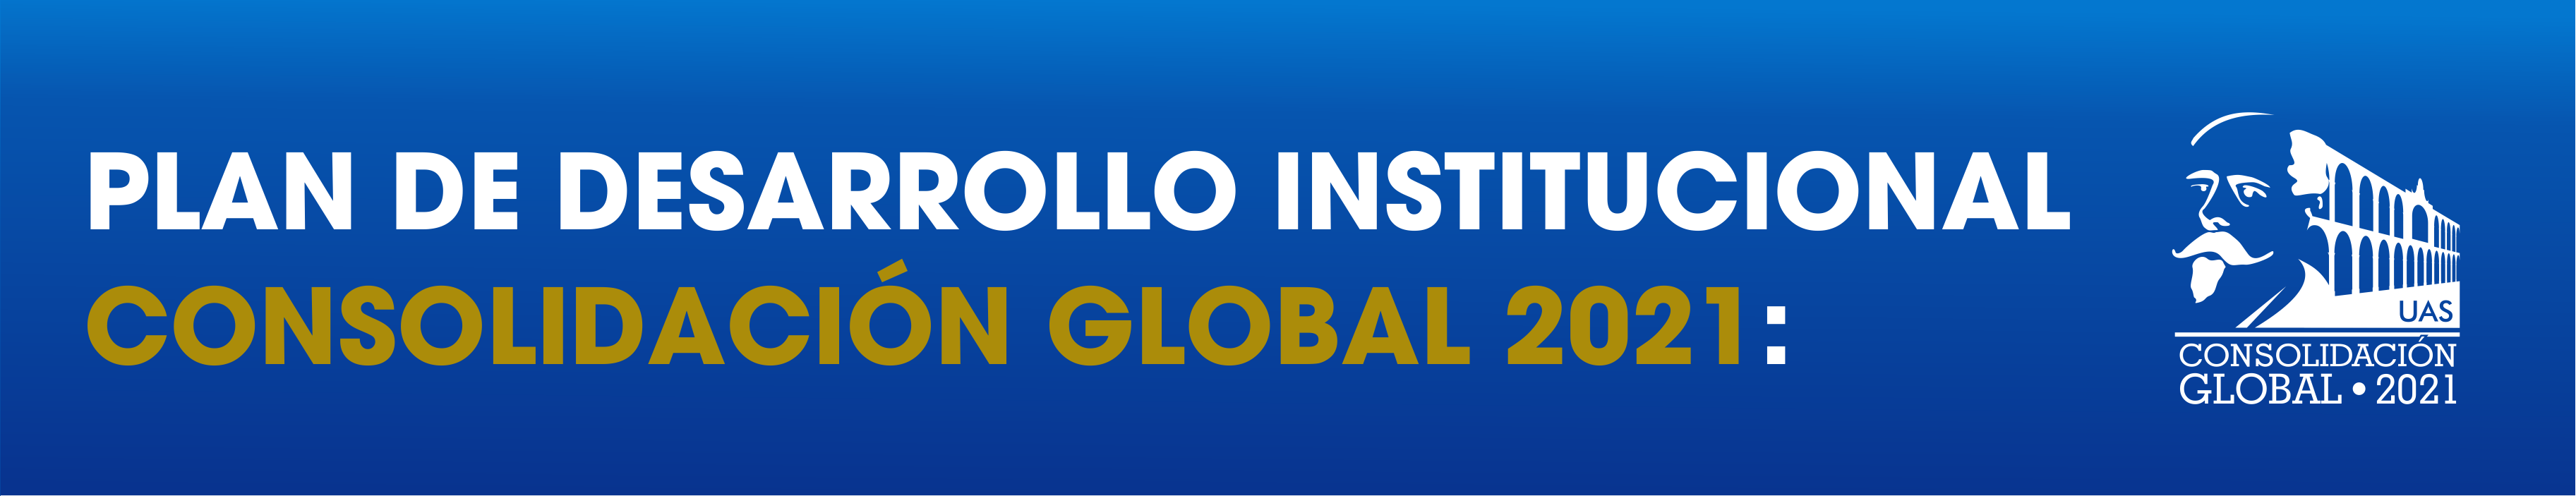 PDI CONSOLIDACIÓN GLOBAL 2021 : FOROS PARA GENERACIÓN DE ...